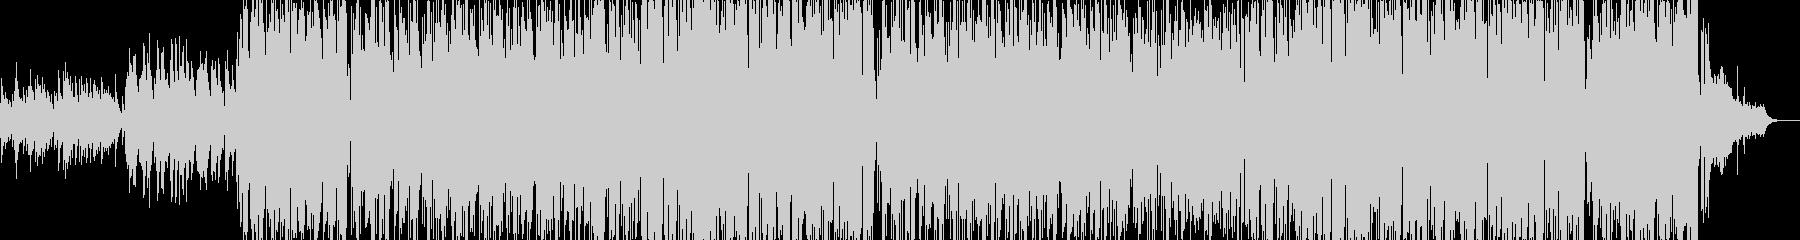 JPOPのカラオケのようなPOP曲の未再生の波形